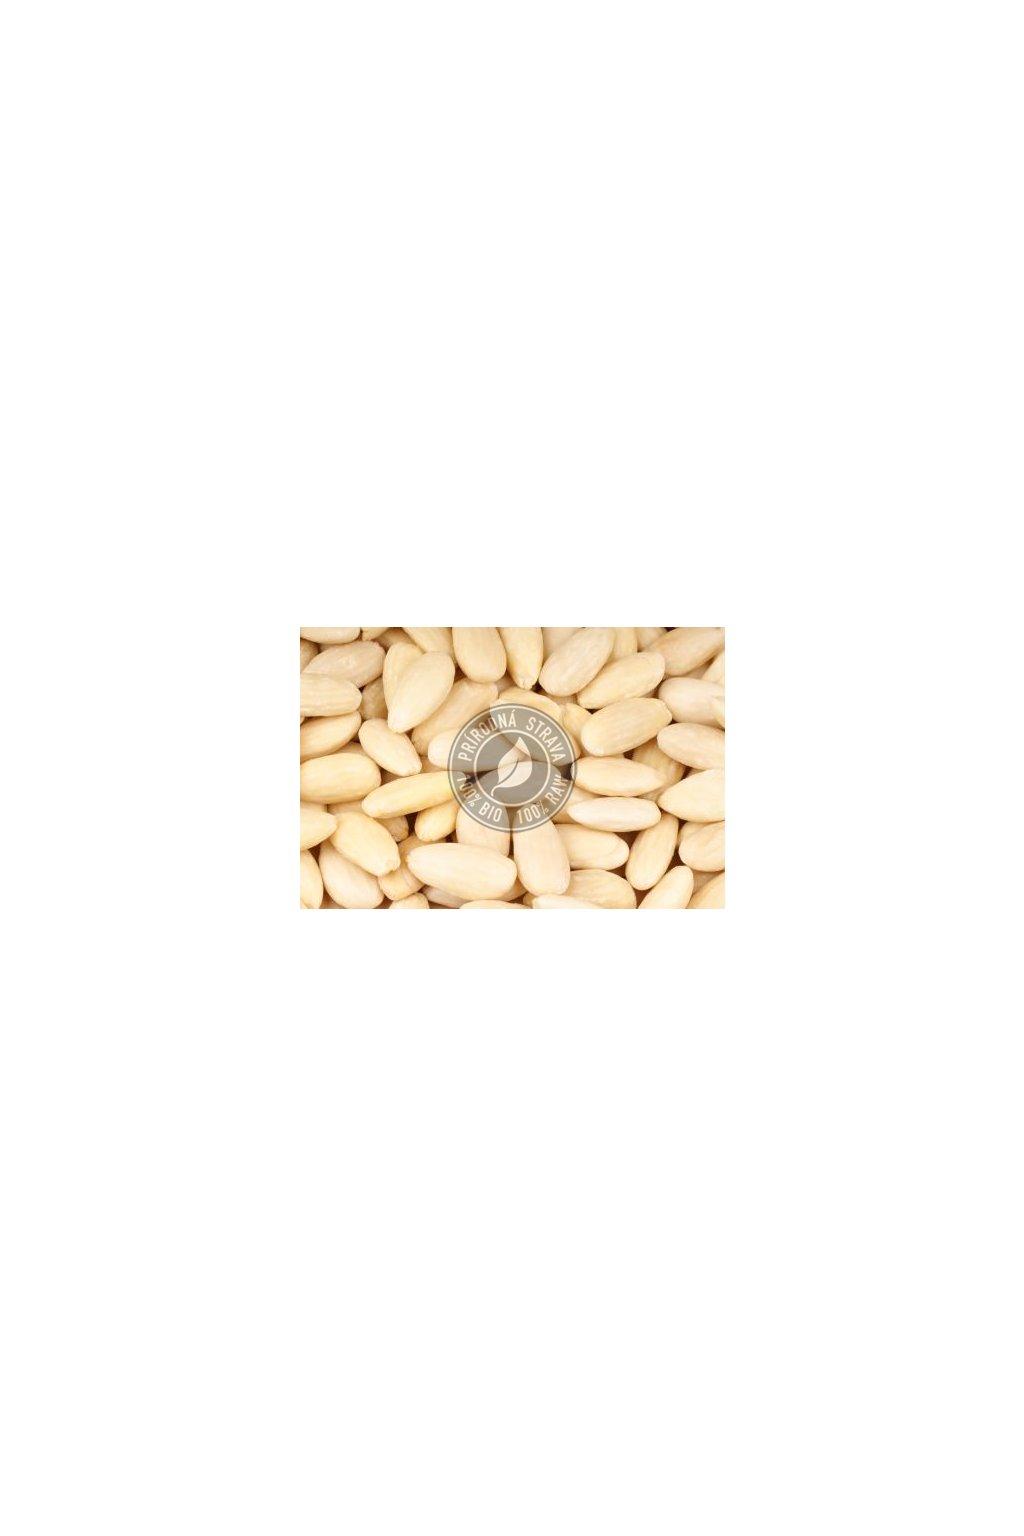 Mandle lúpané, biele jadrá - 500g